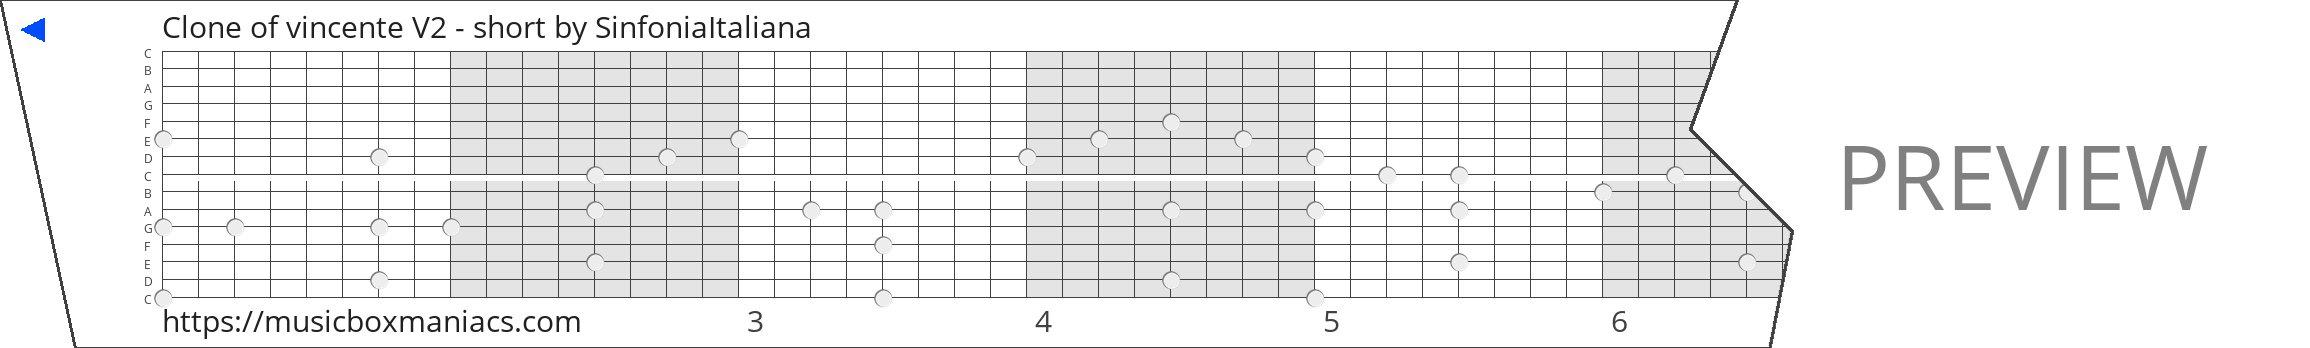 Clone of vincente V2 - short 15 note music box paper strip